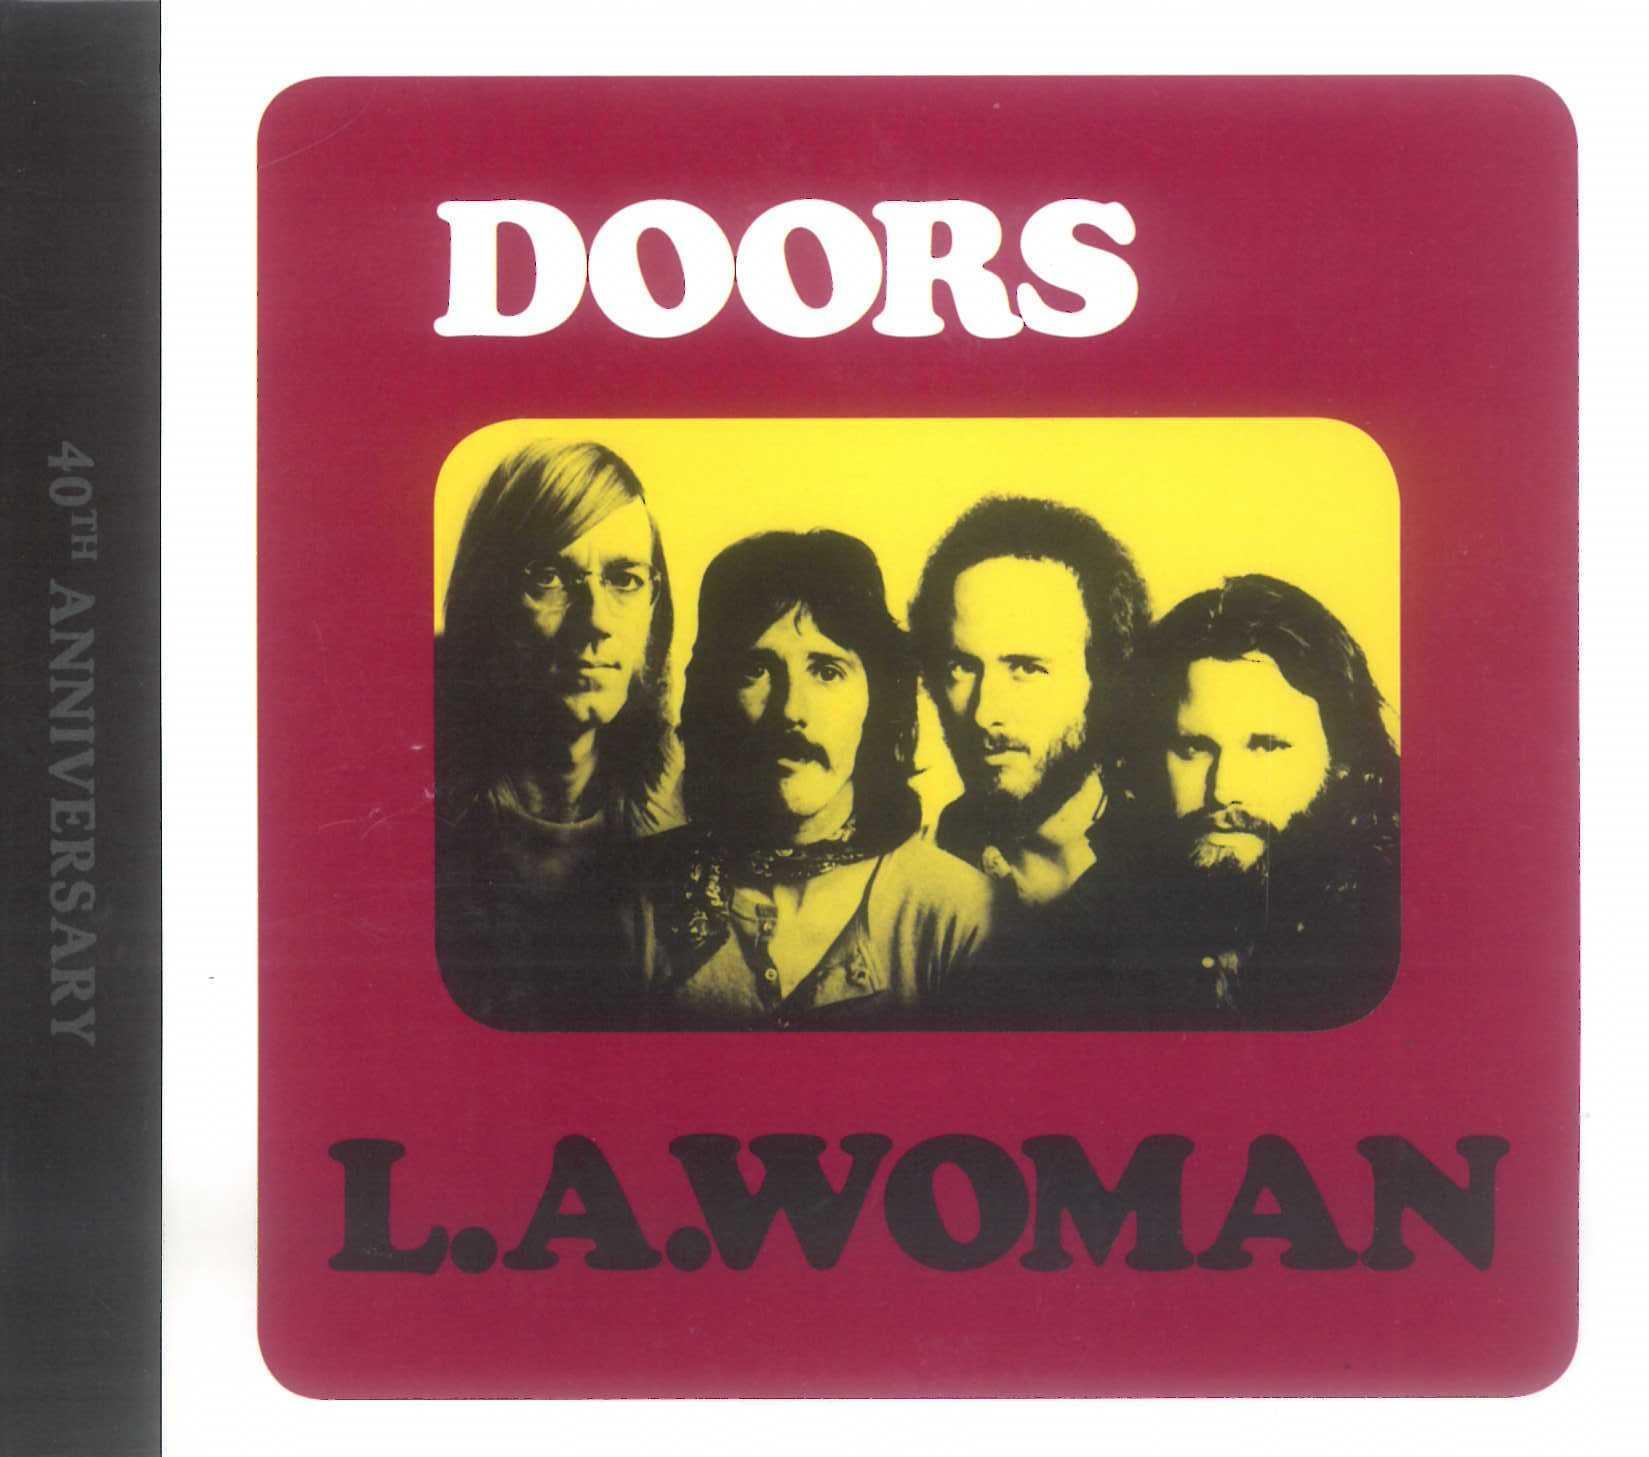 L.A. woman (40th anniversary edition)